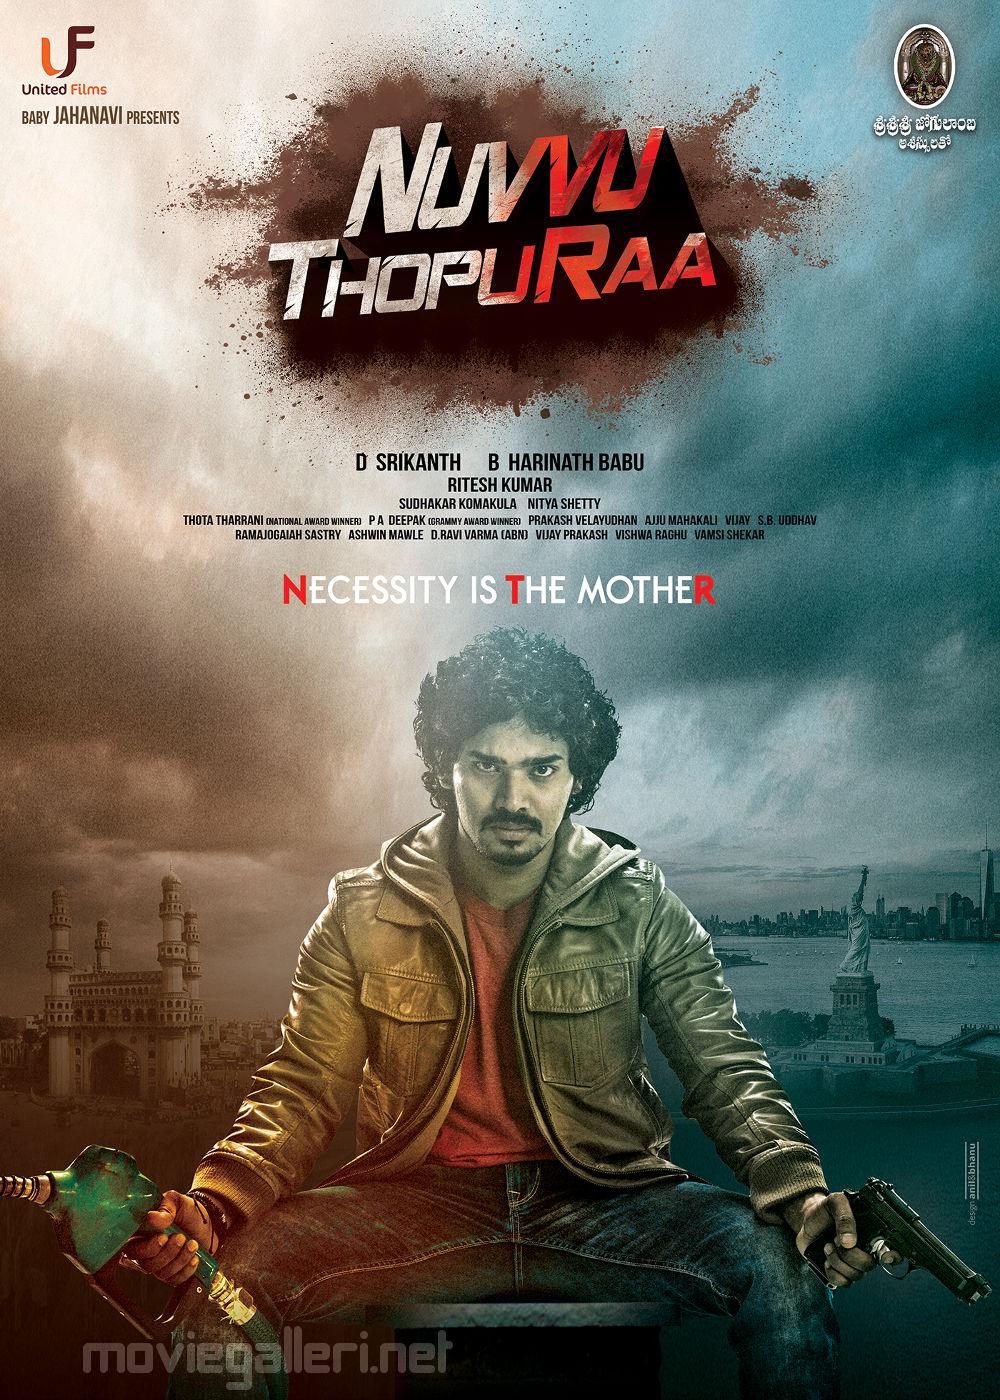 Hero Sudhakar Komakula Nuvvu Thopuraa Movie First Look Posters